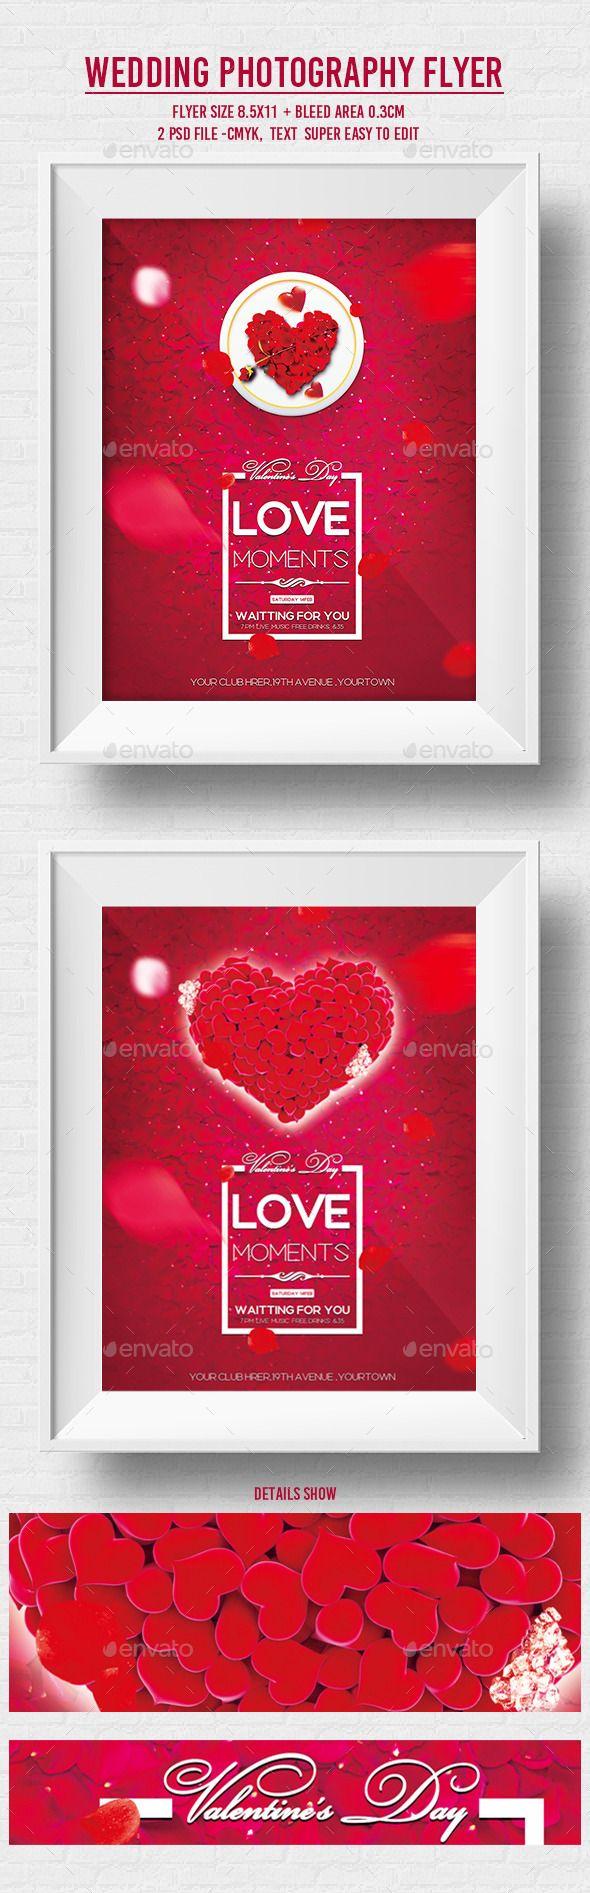 Valentines Day Flyer Template #design Download: http://graphicriver.net/item/valentines-day-flyer/10111382?ref=ksioks